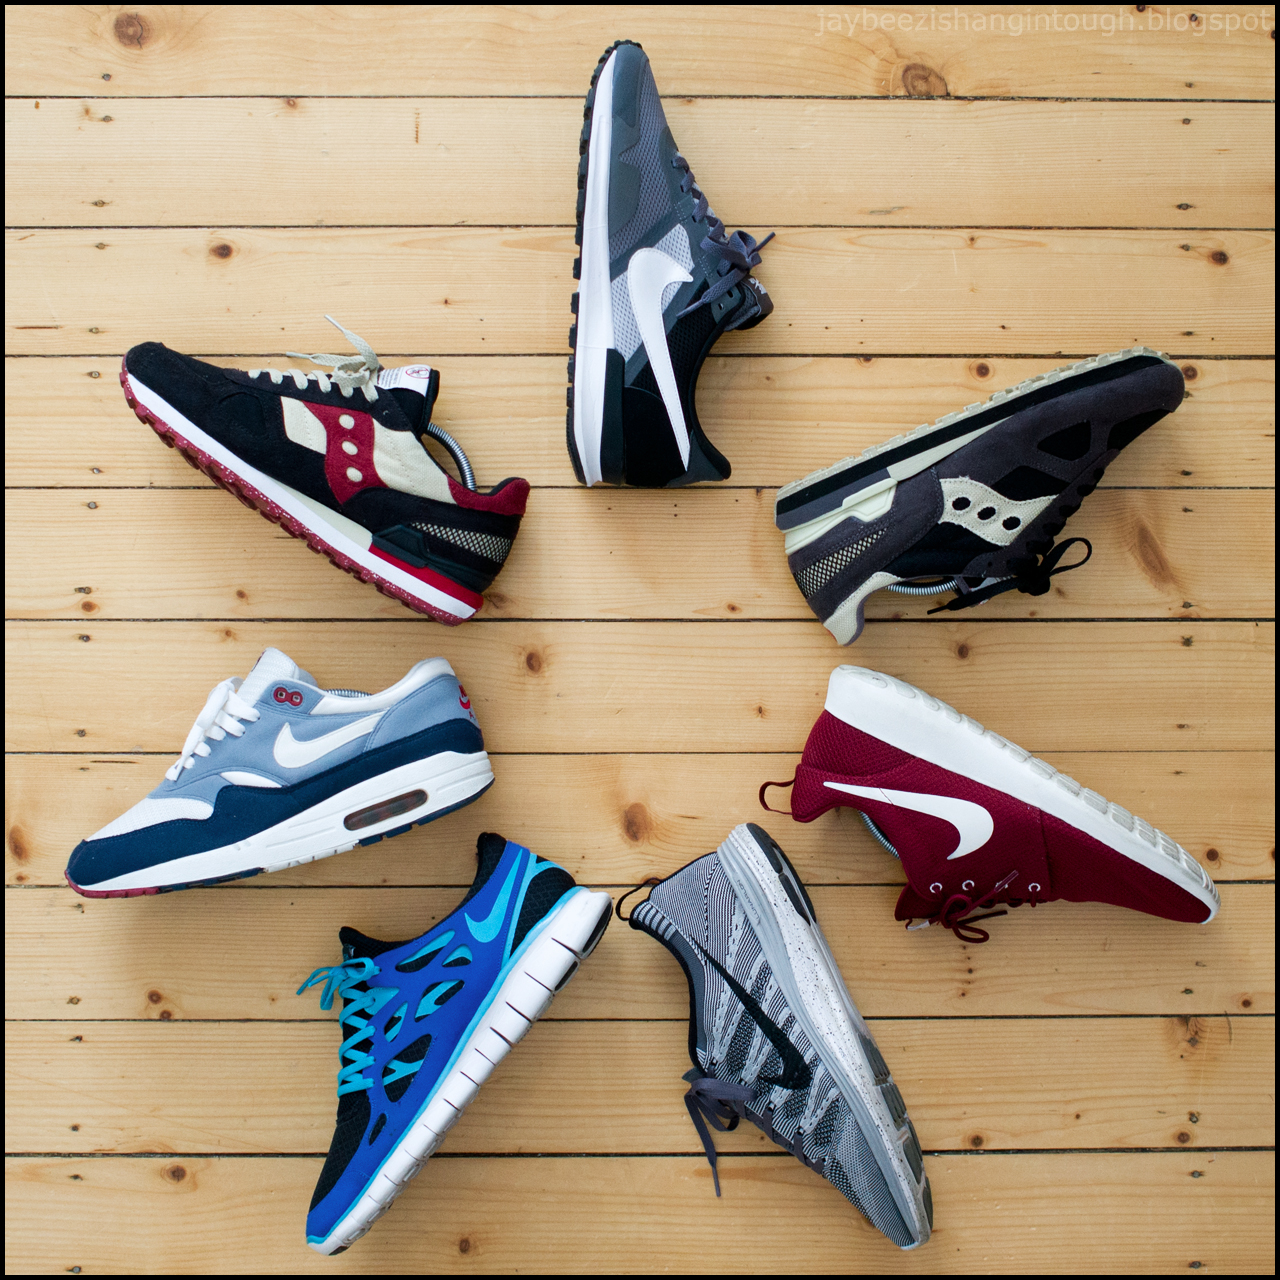 jaybeez is hangin' tough: sneaker rotation